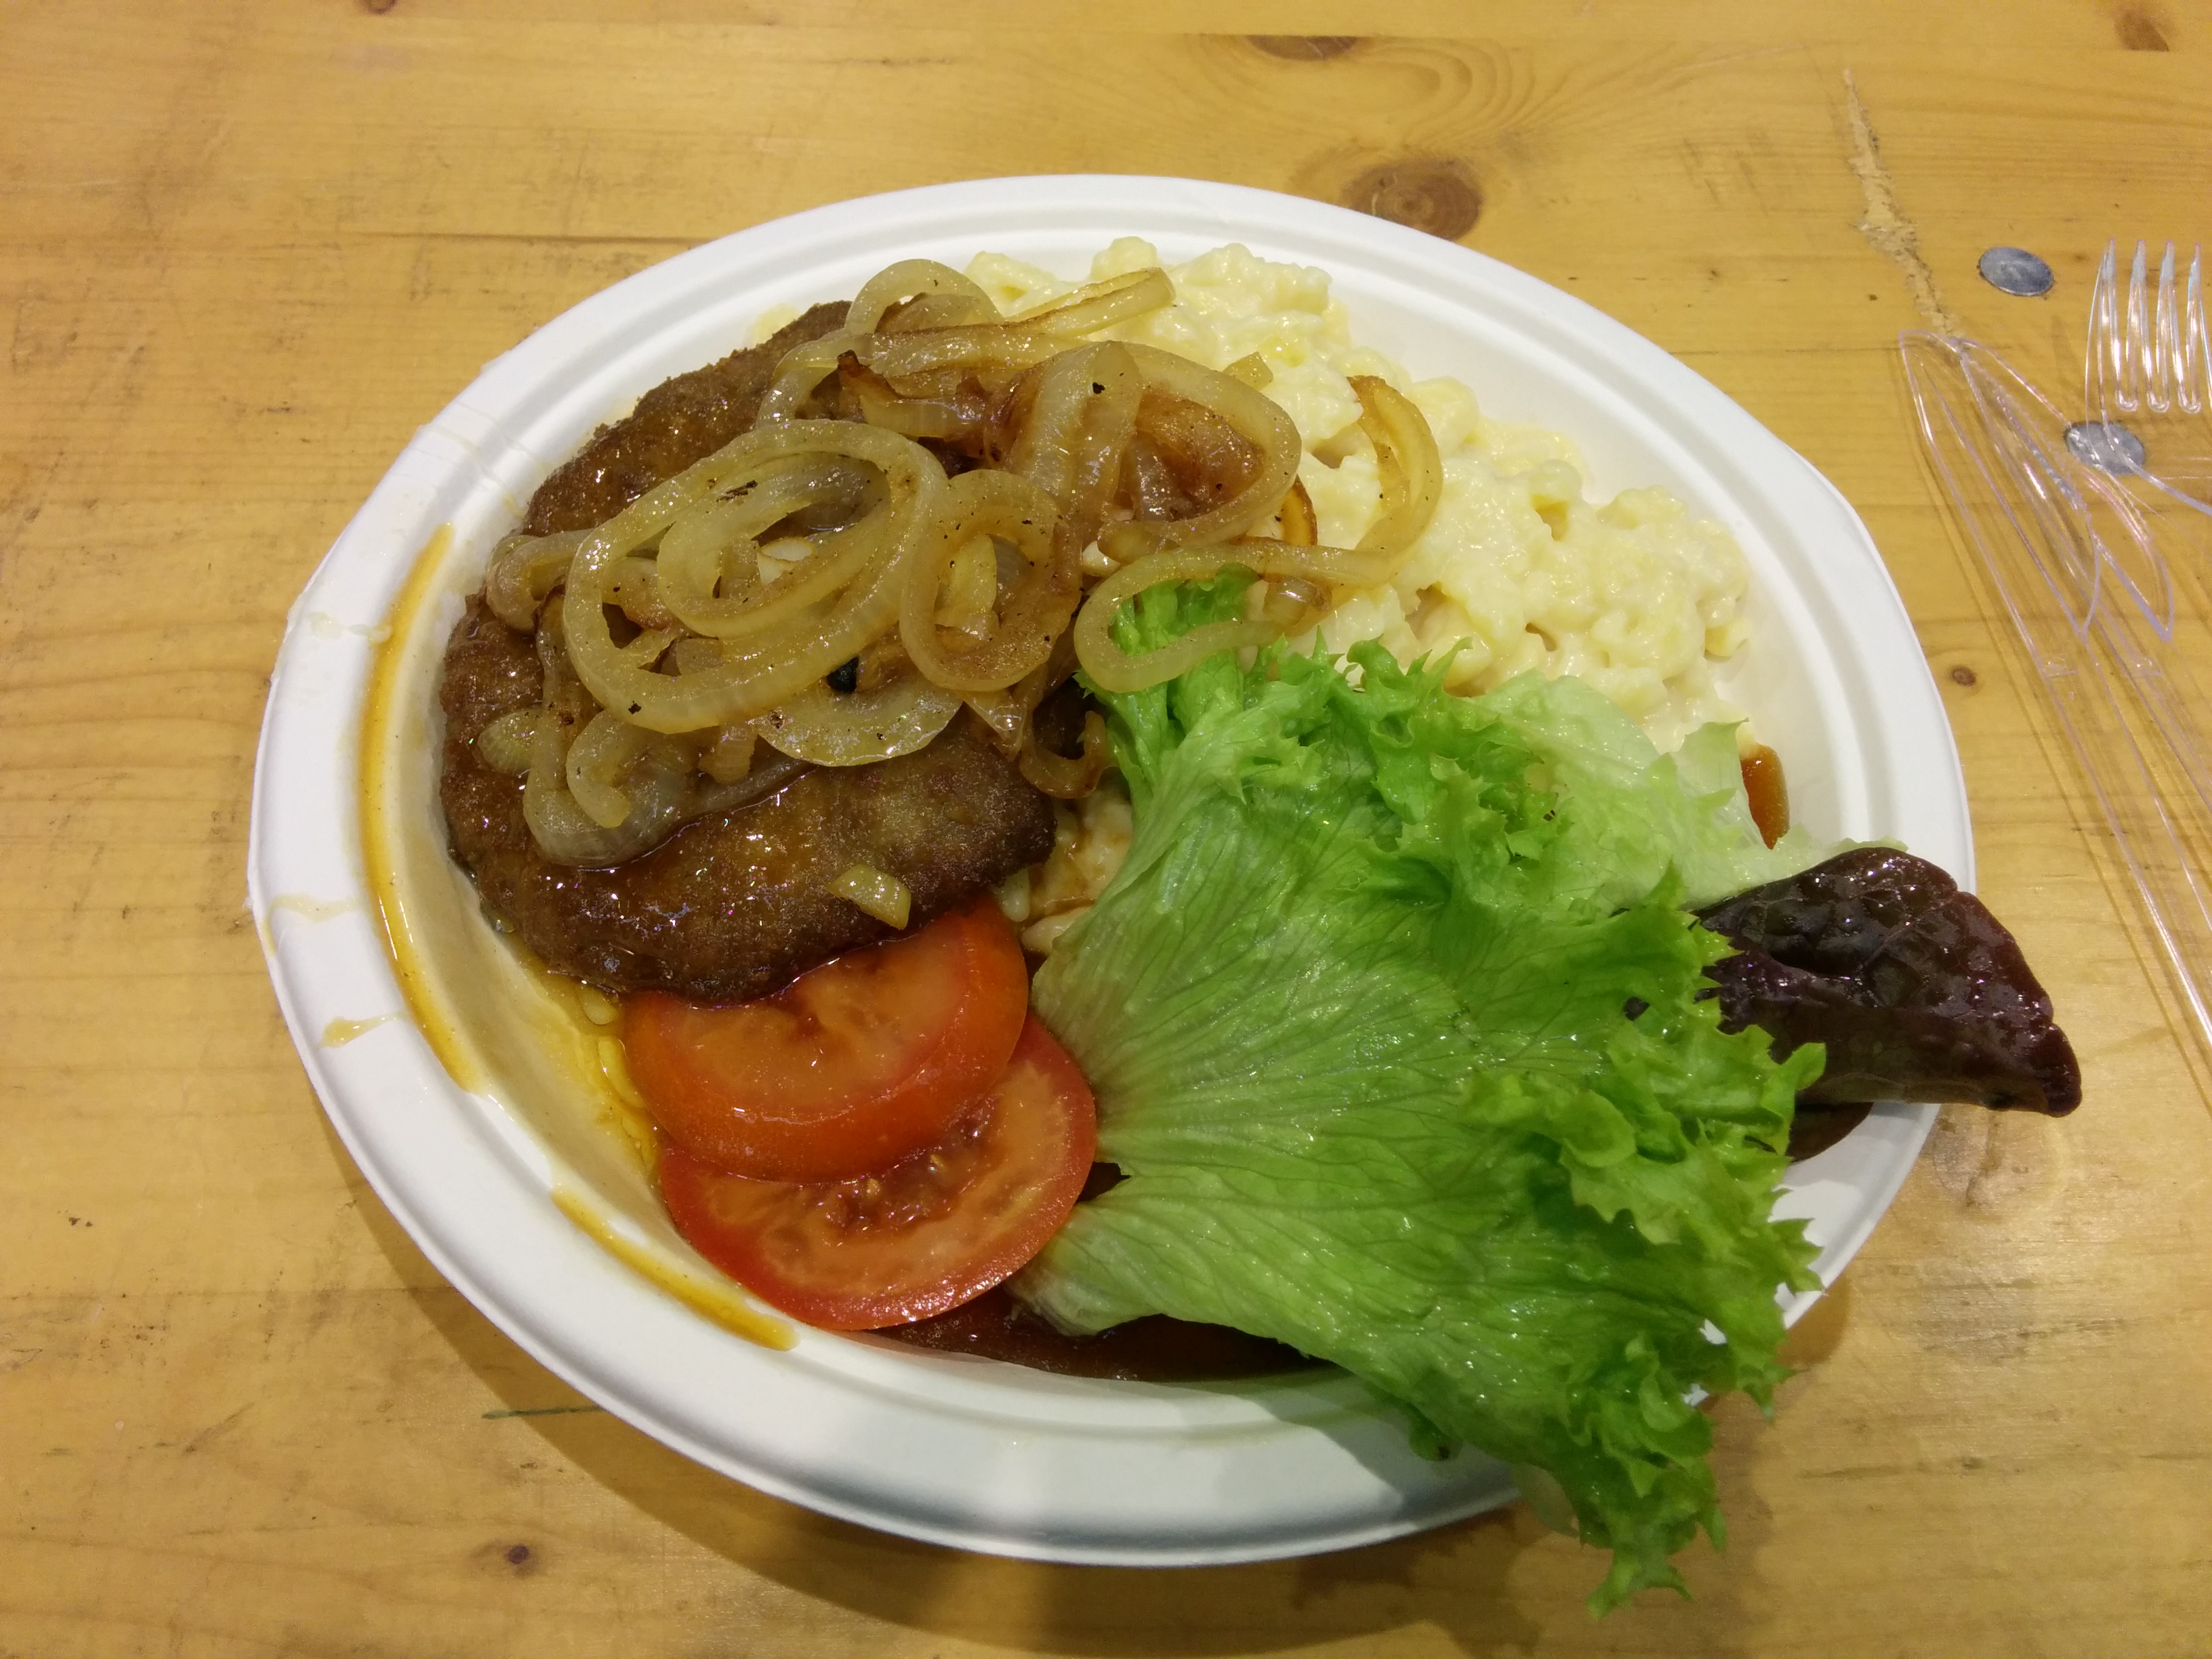 https://foodloader.net/nico_2013-11-24_zwiebelrostbraten-aus-rinderhack-mit-kaesespaetzle.jpg